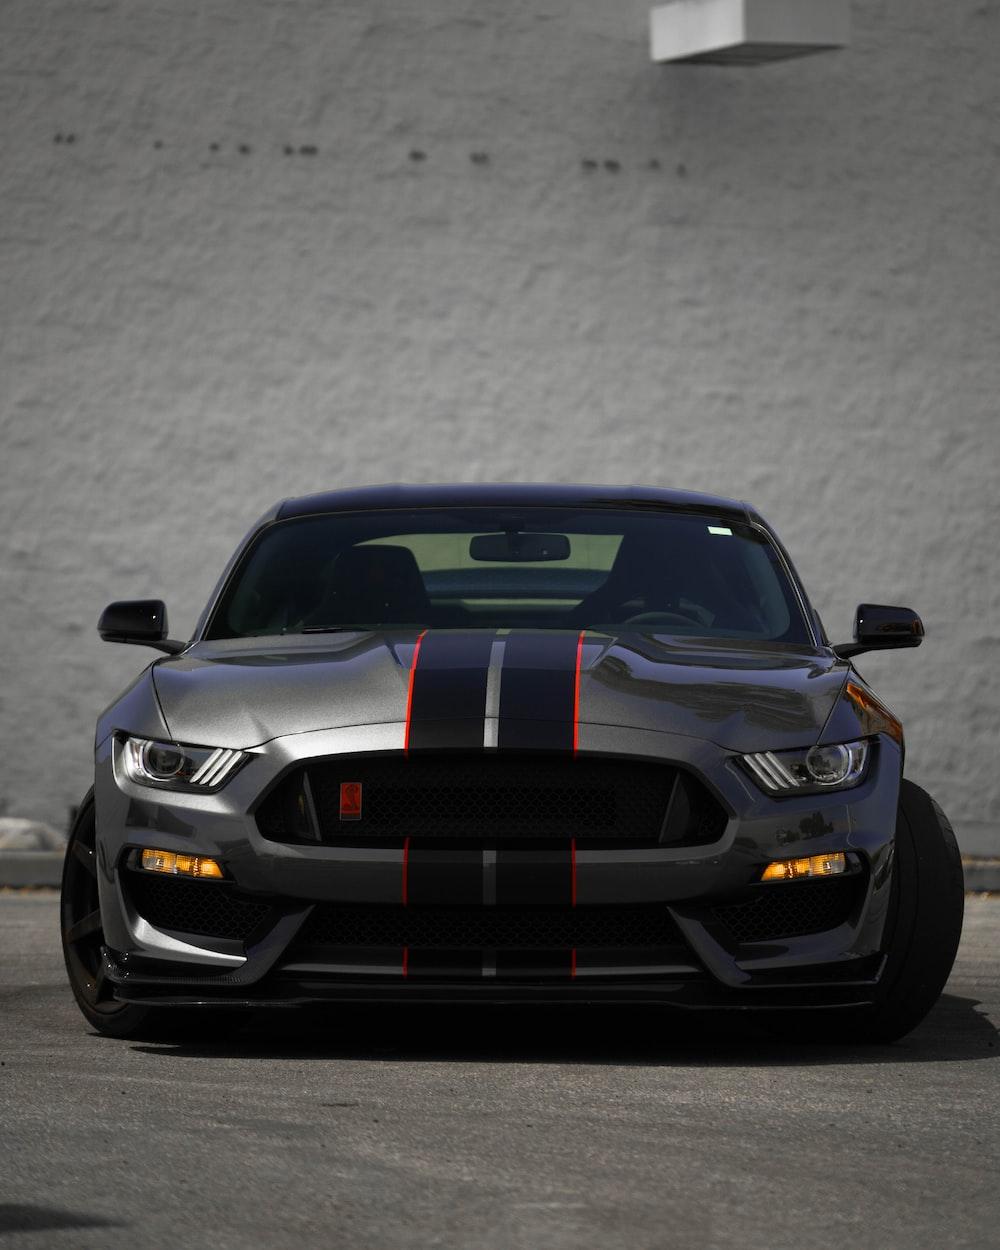 Mustang Wallpapers: Free HD Download [500+ HQ] | Unsplash